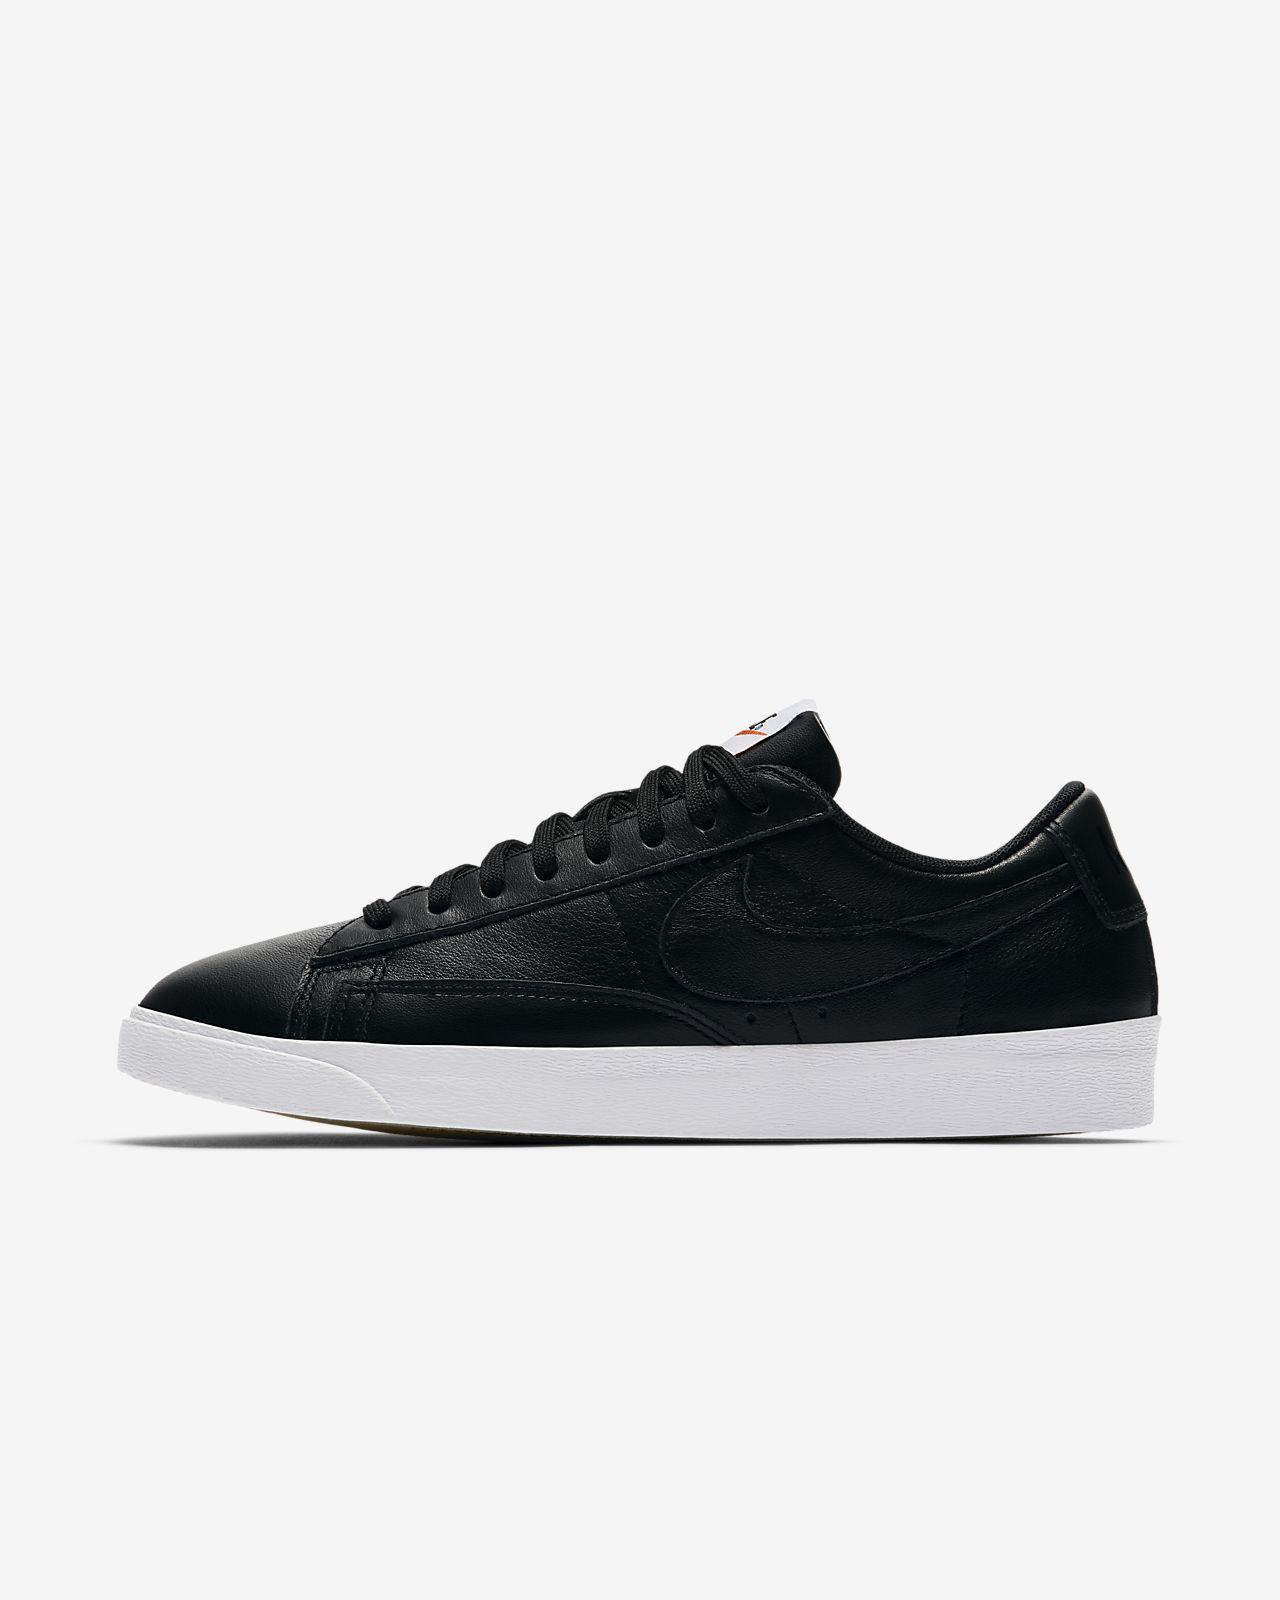 Nike Blazer Noir Haut Bas Jupe